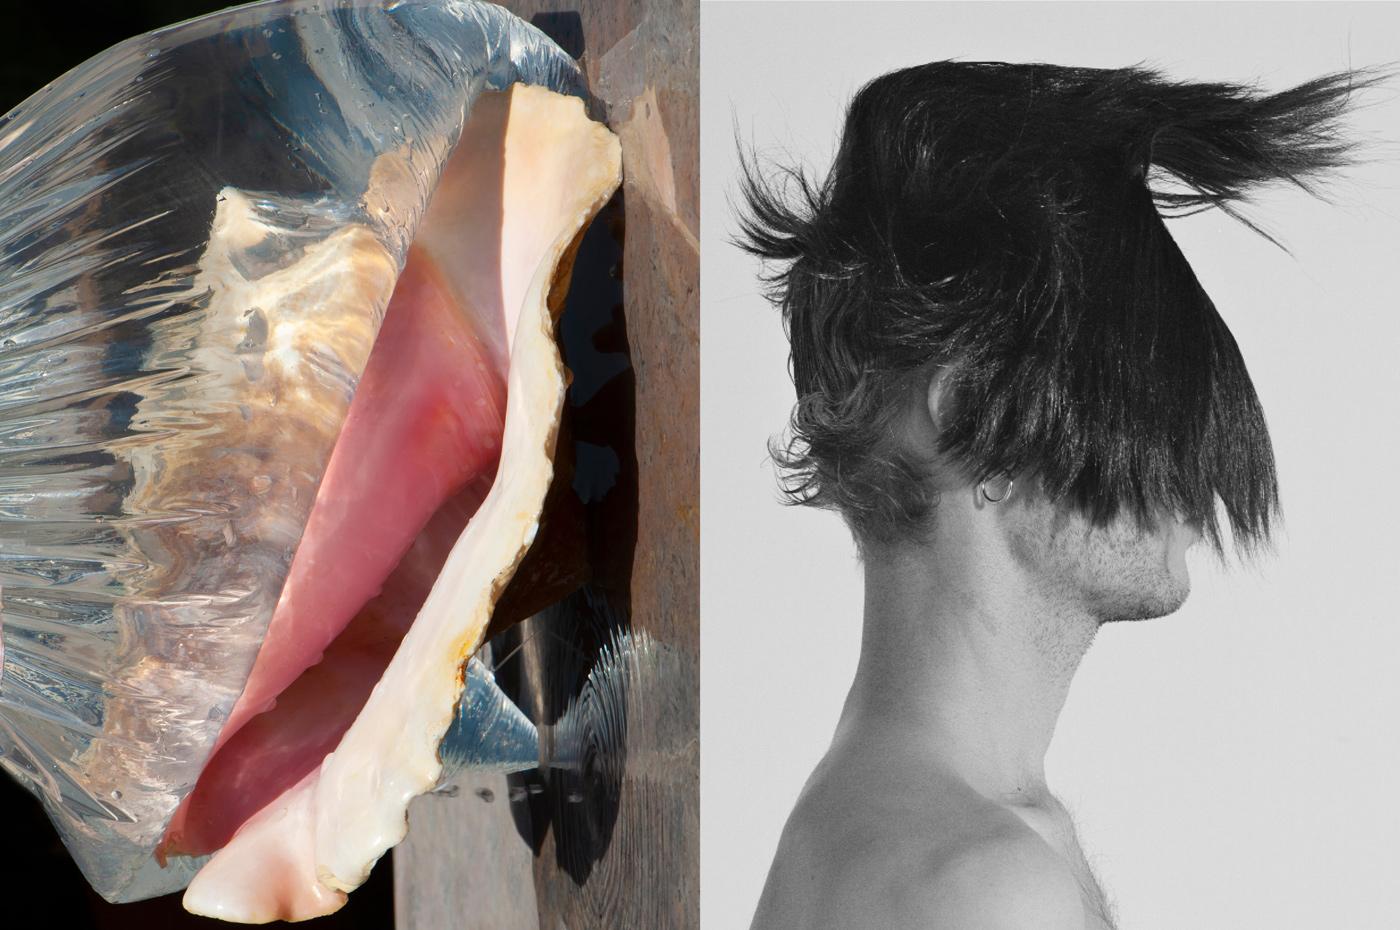 10 collide24 Europium - Europium's collaborative practice explores the relationship between photography and graphic design